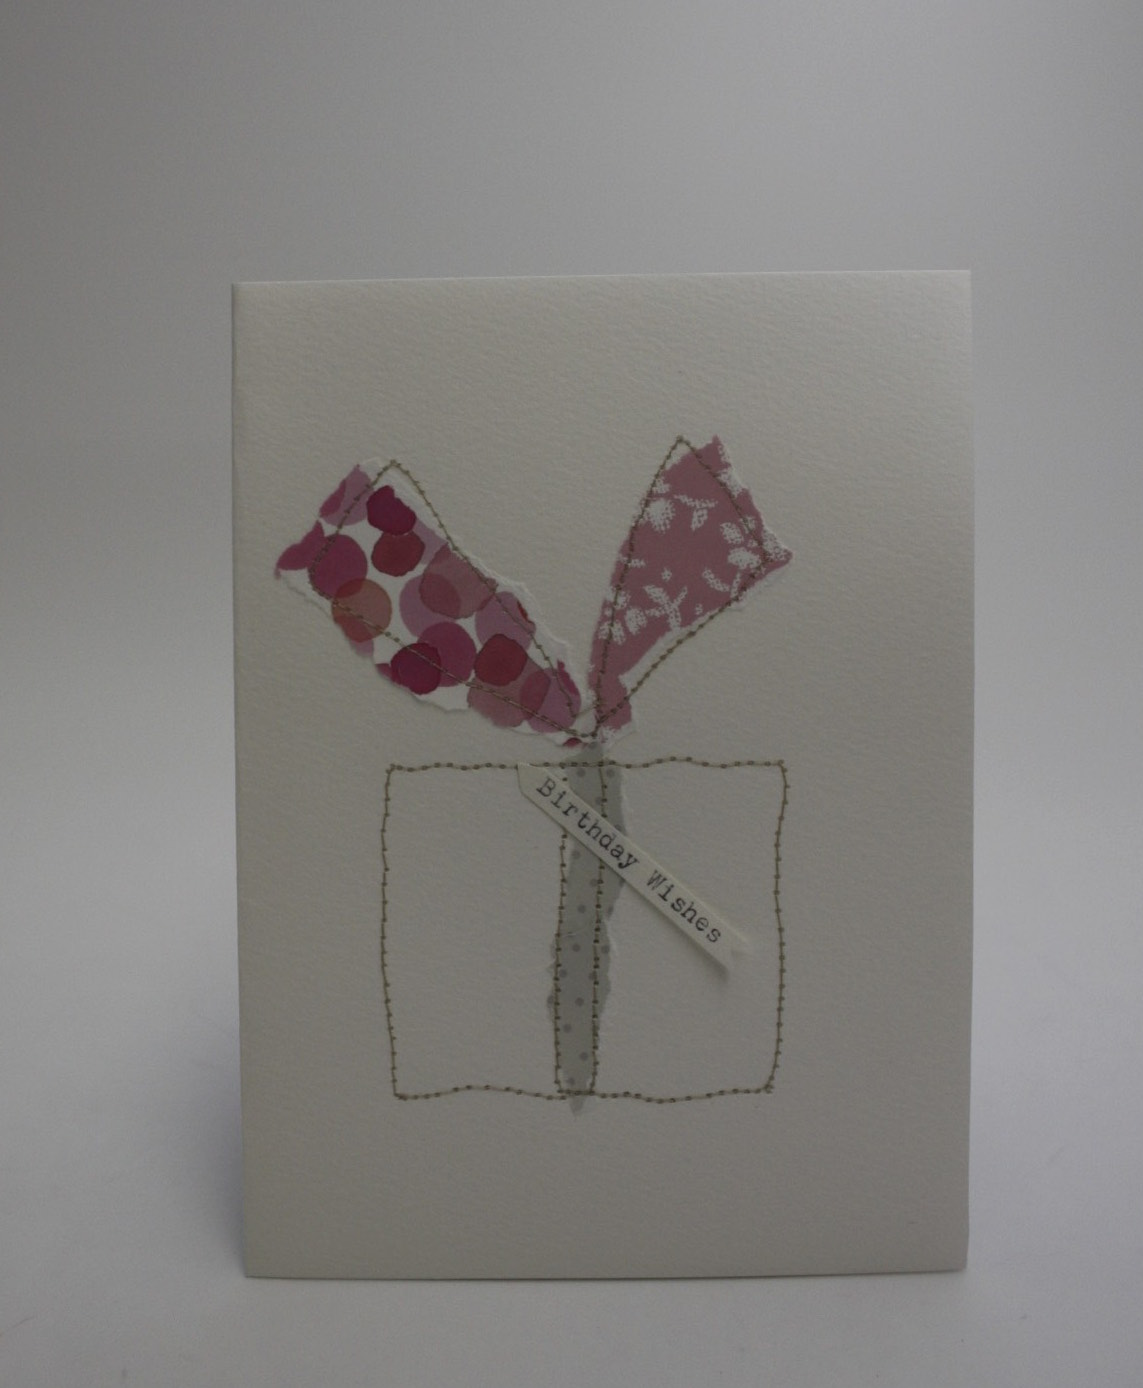 12Birthday_Card_personalised_bespoke_design_and _message.jpg